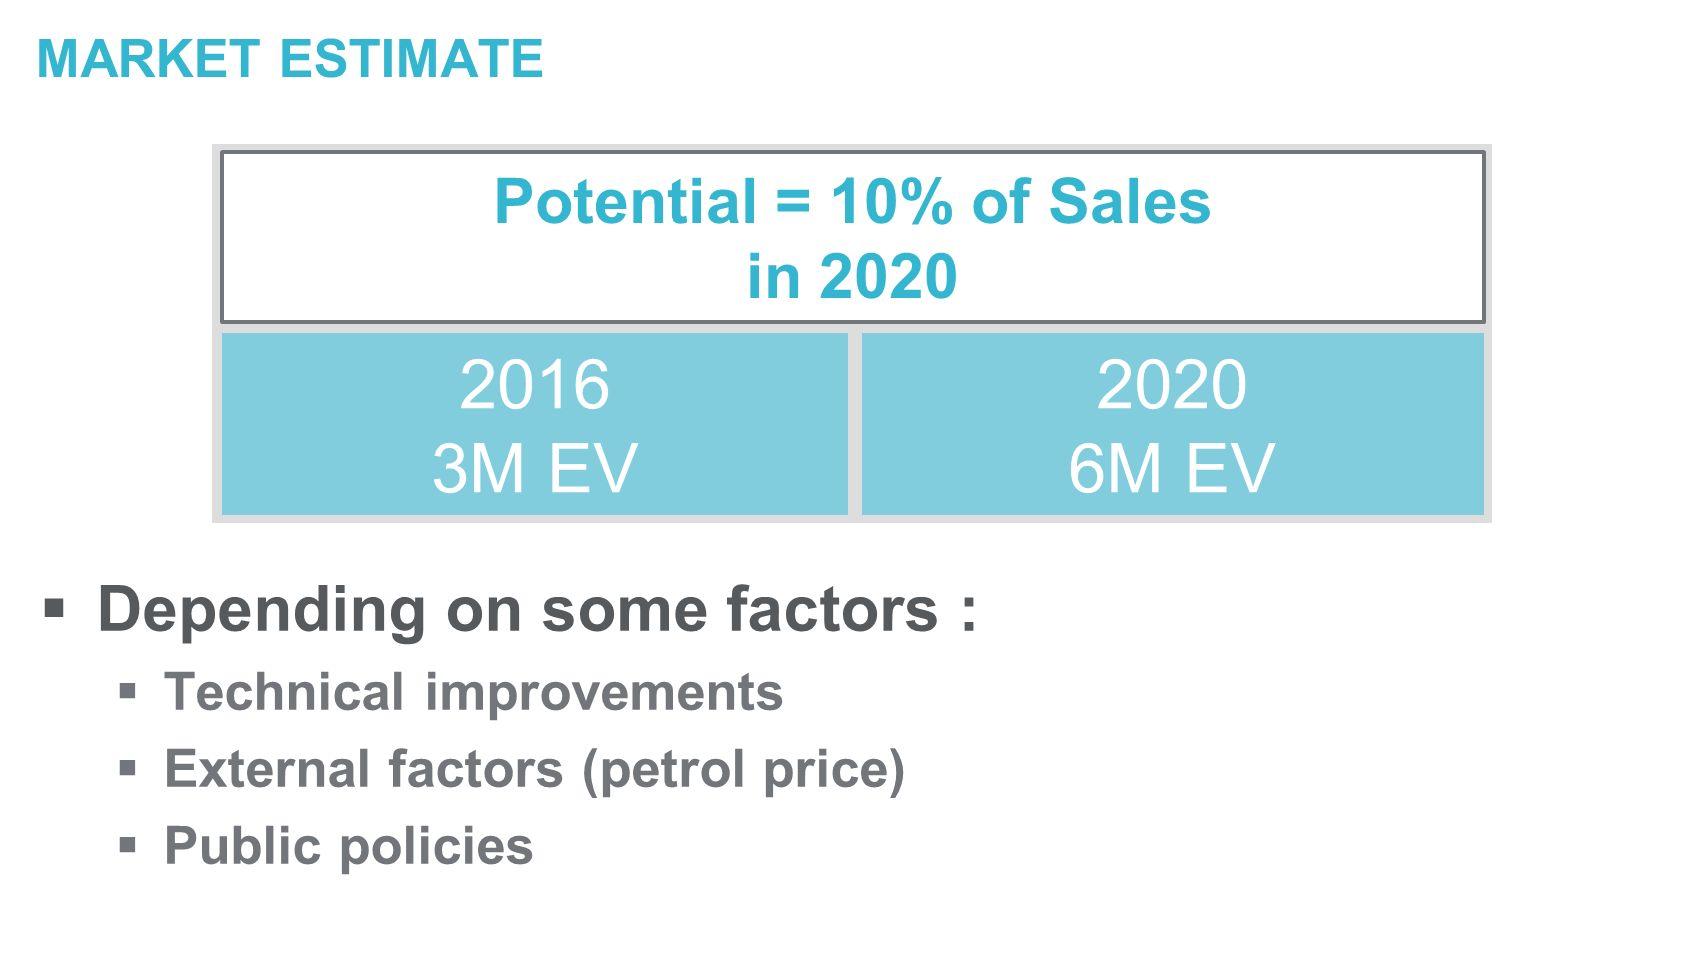 MARKET ESTIMATE Depending on some factors : Technical improvements External factors (petrol price) Public policies 2016 3M EV 2020 6M EV Potential = 10% of Sales in 2020